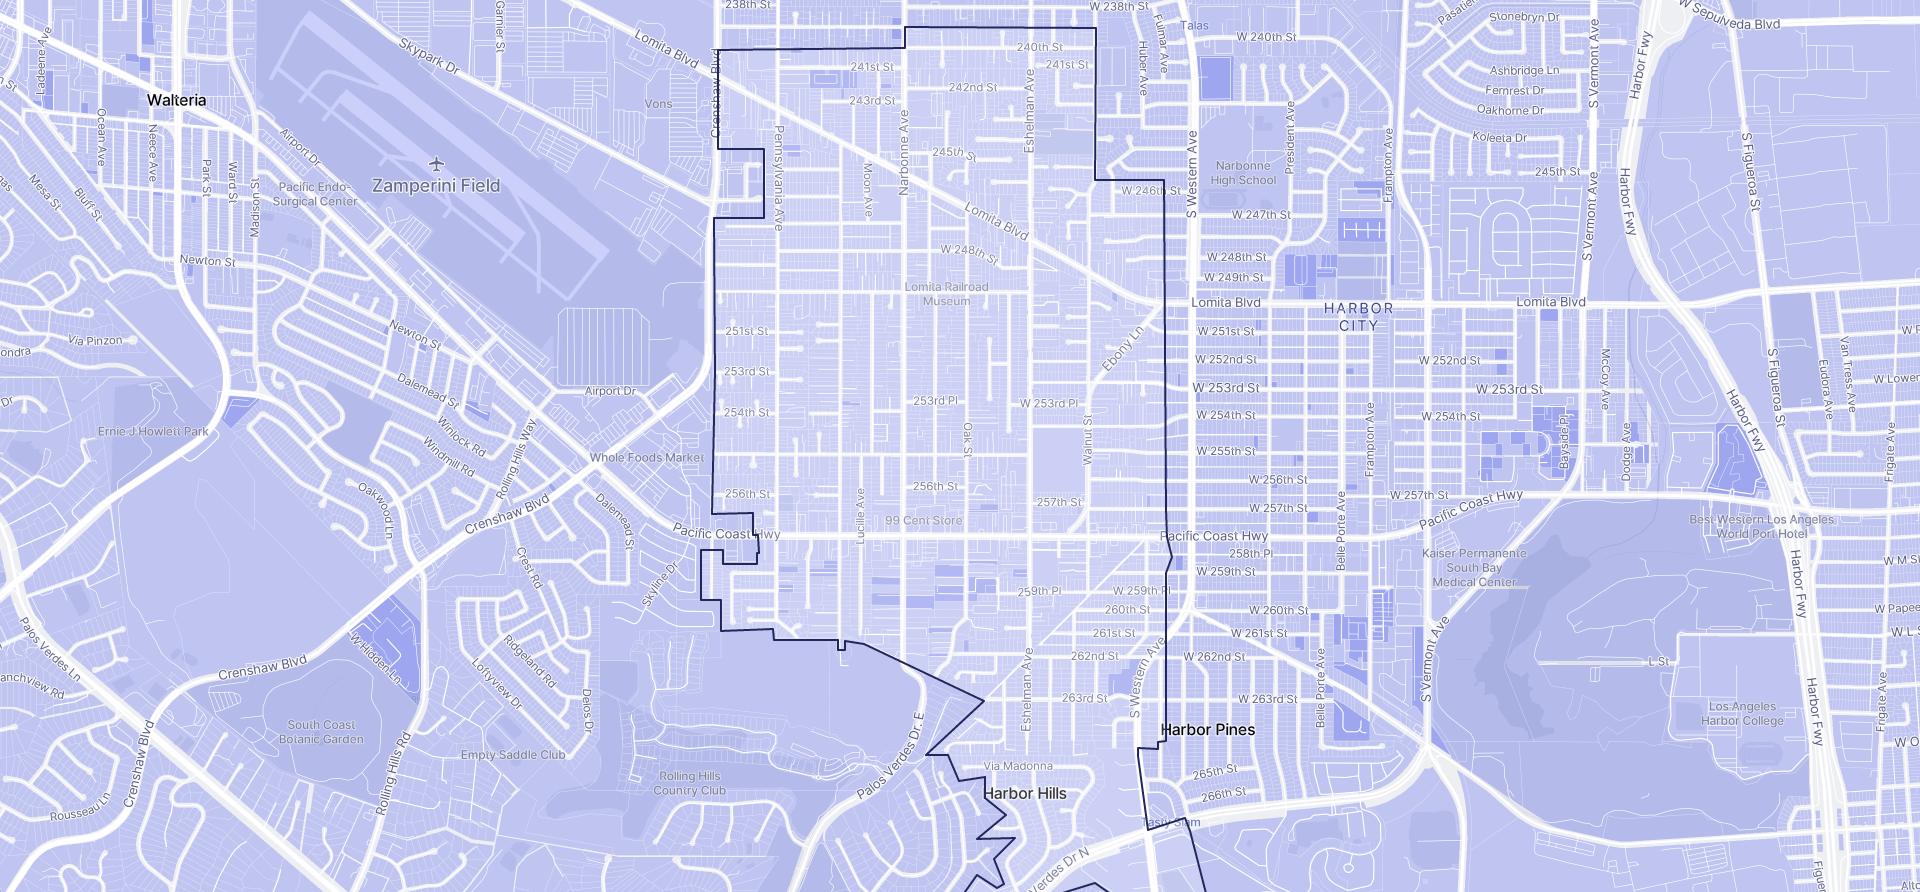 Image of Lomita boundaries on a map.